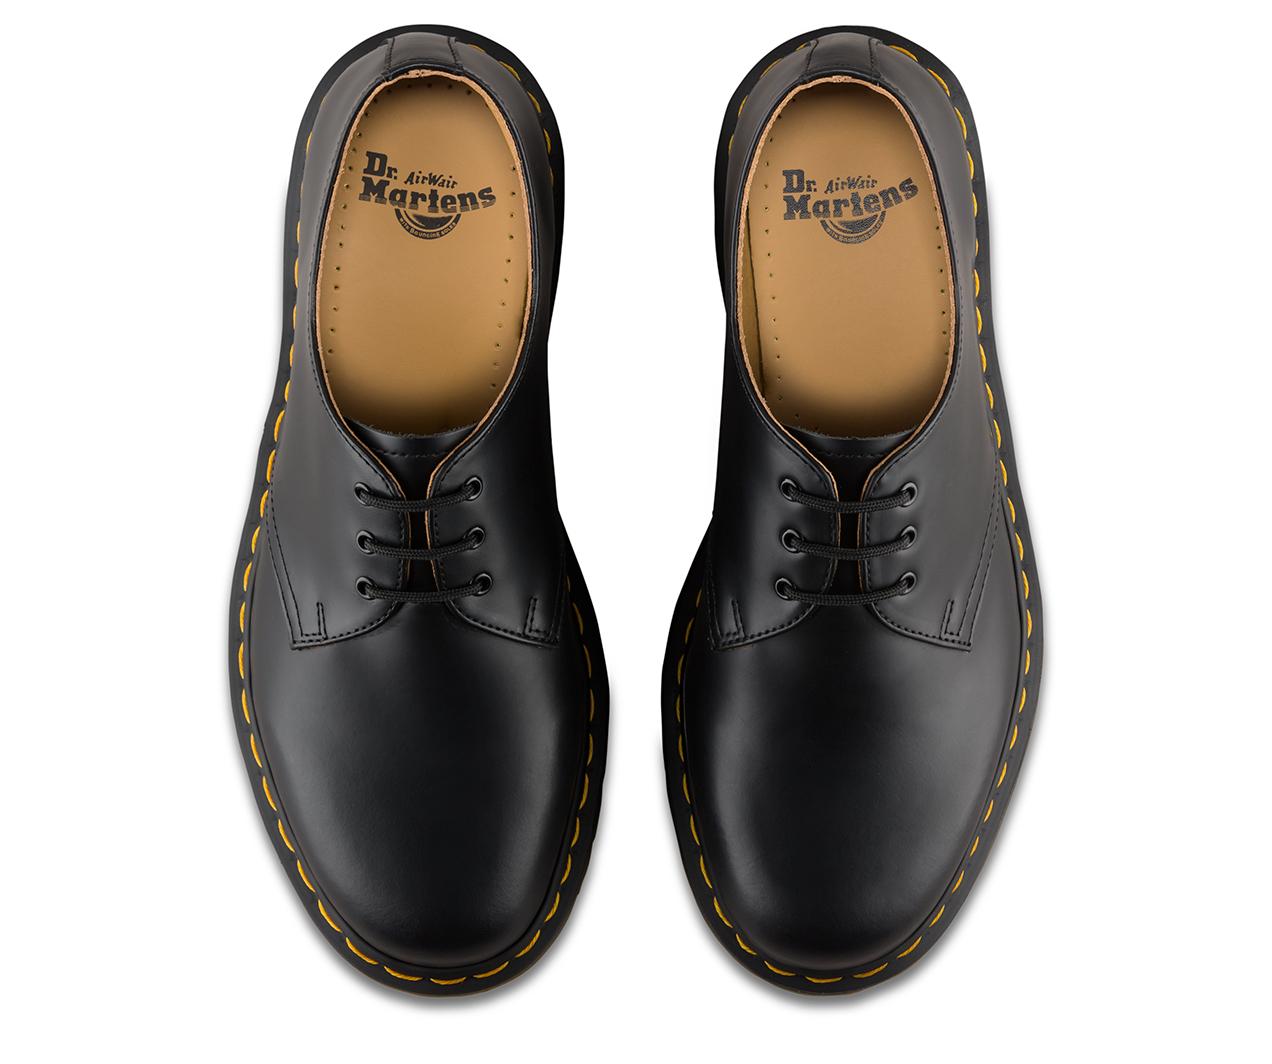 besson chaussures doc martens. Black Bedroom Furniture Sets. Home Design Ideas